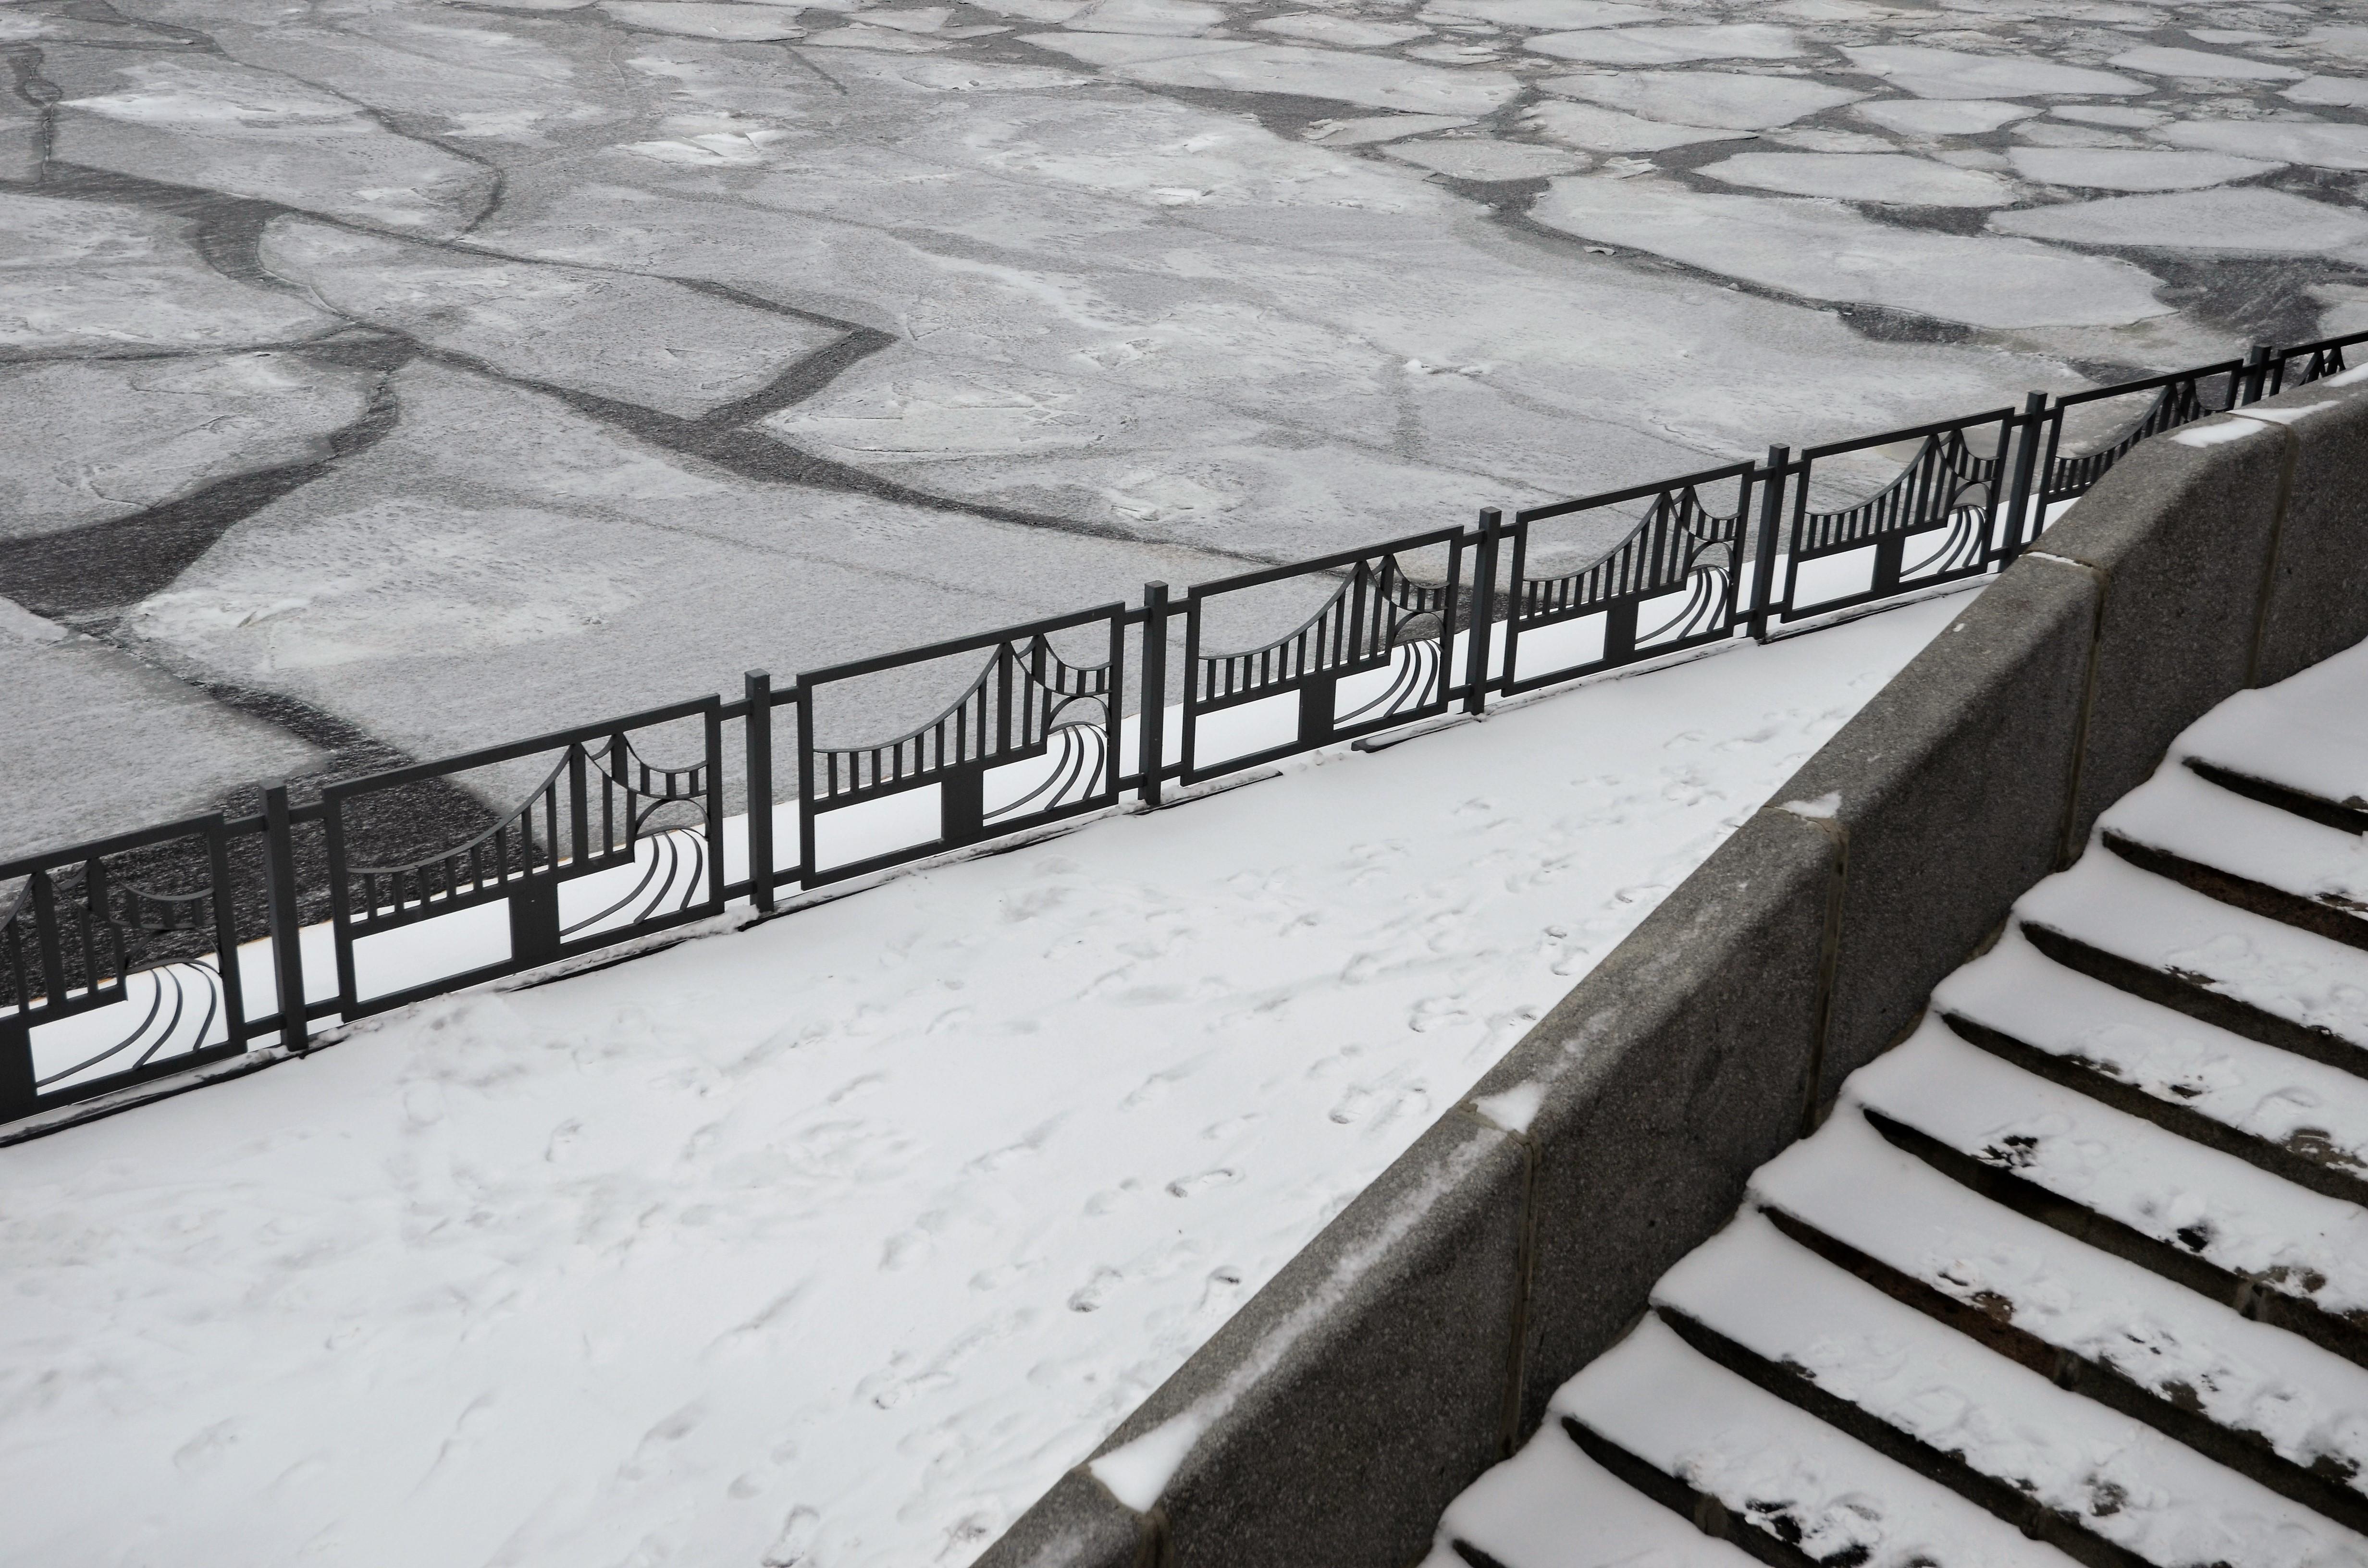 Зимние знаки безопасности установили в Южном округе